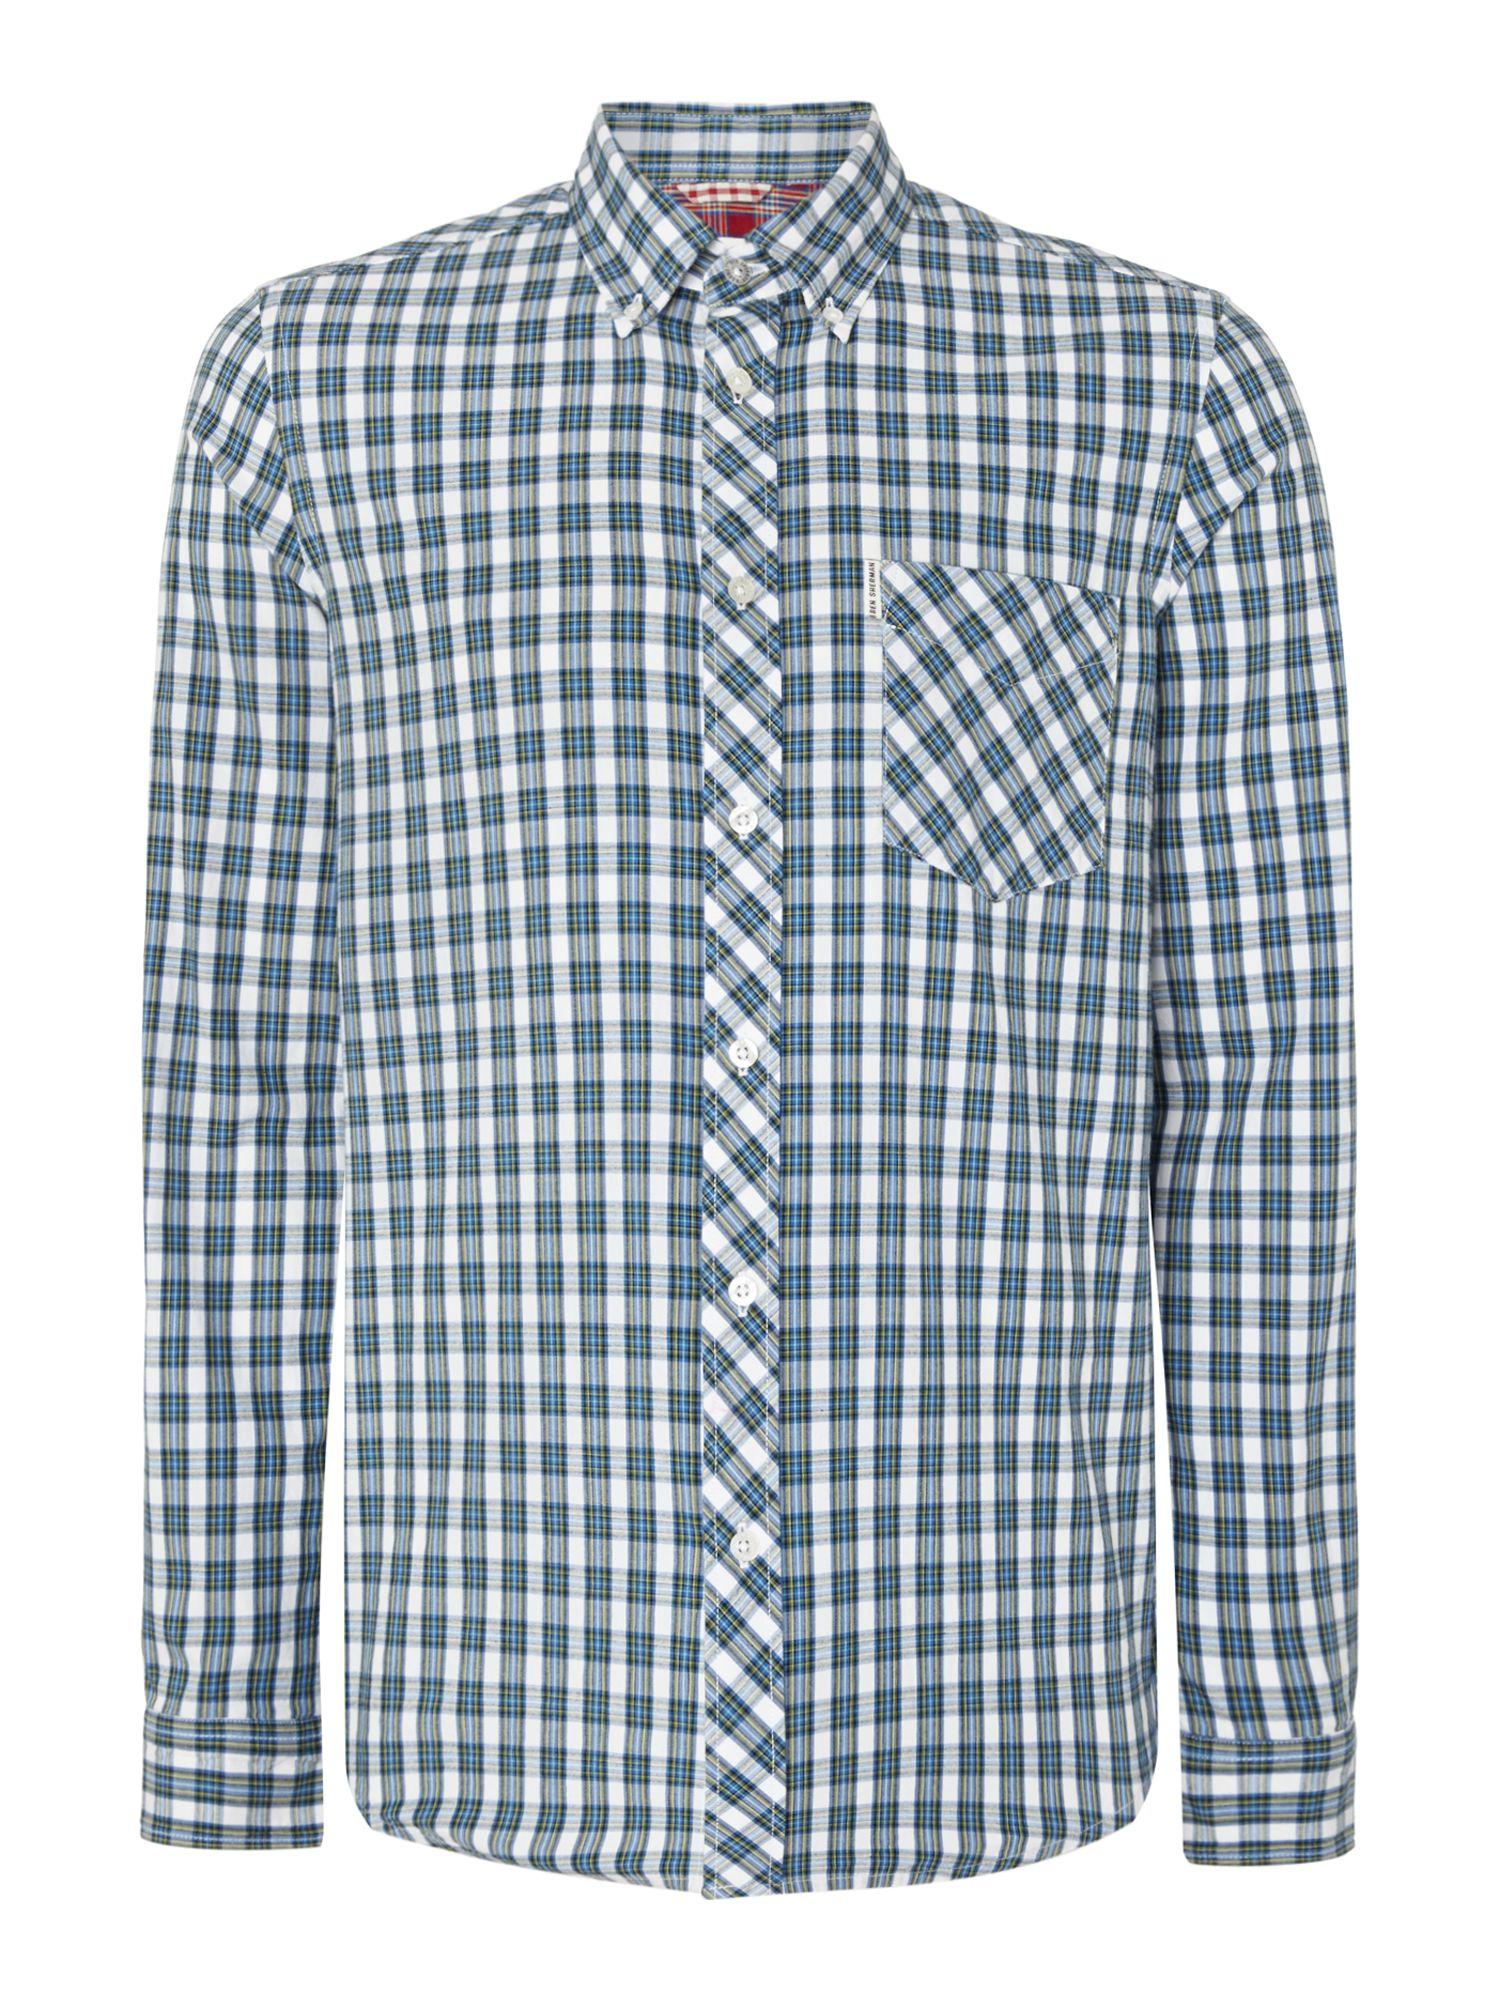 Ben Sherman Oxford Tartan Check Long Sleeve Shirt In Blue